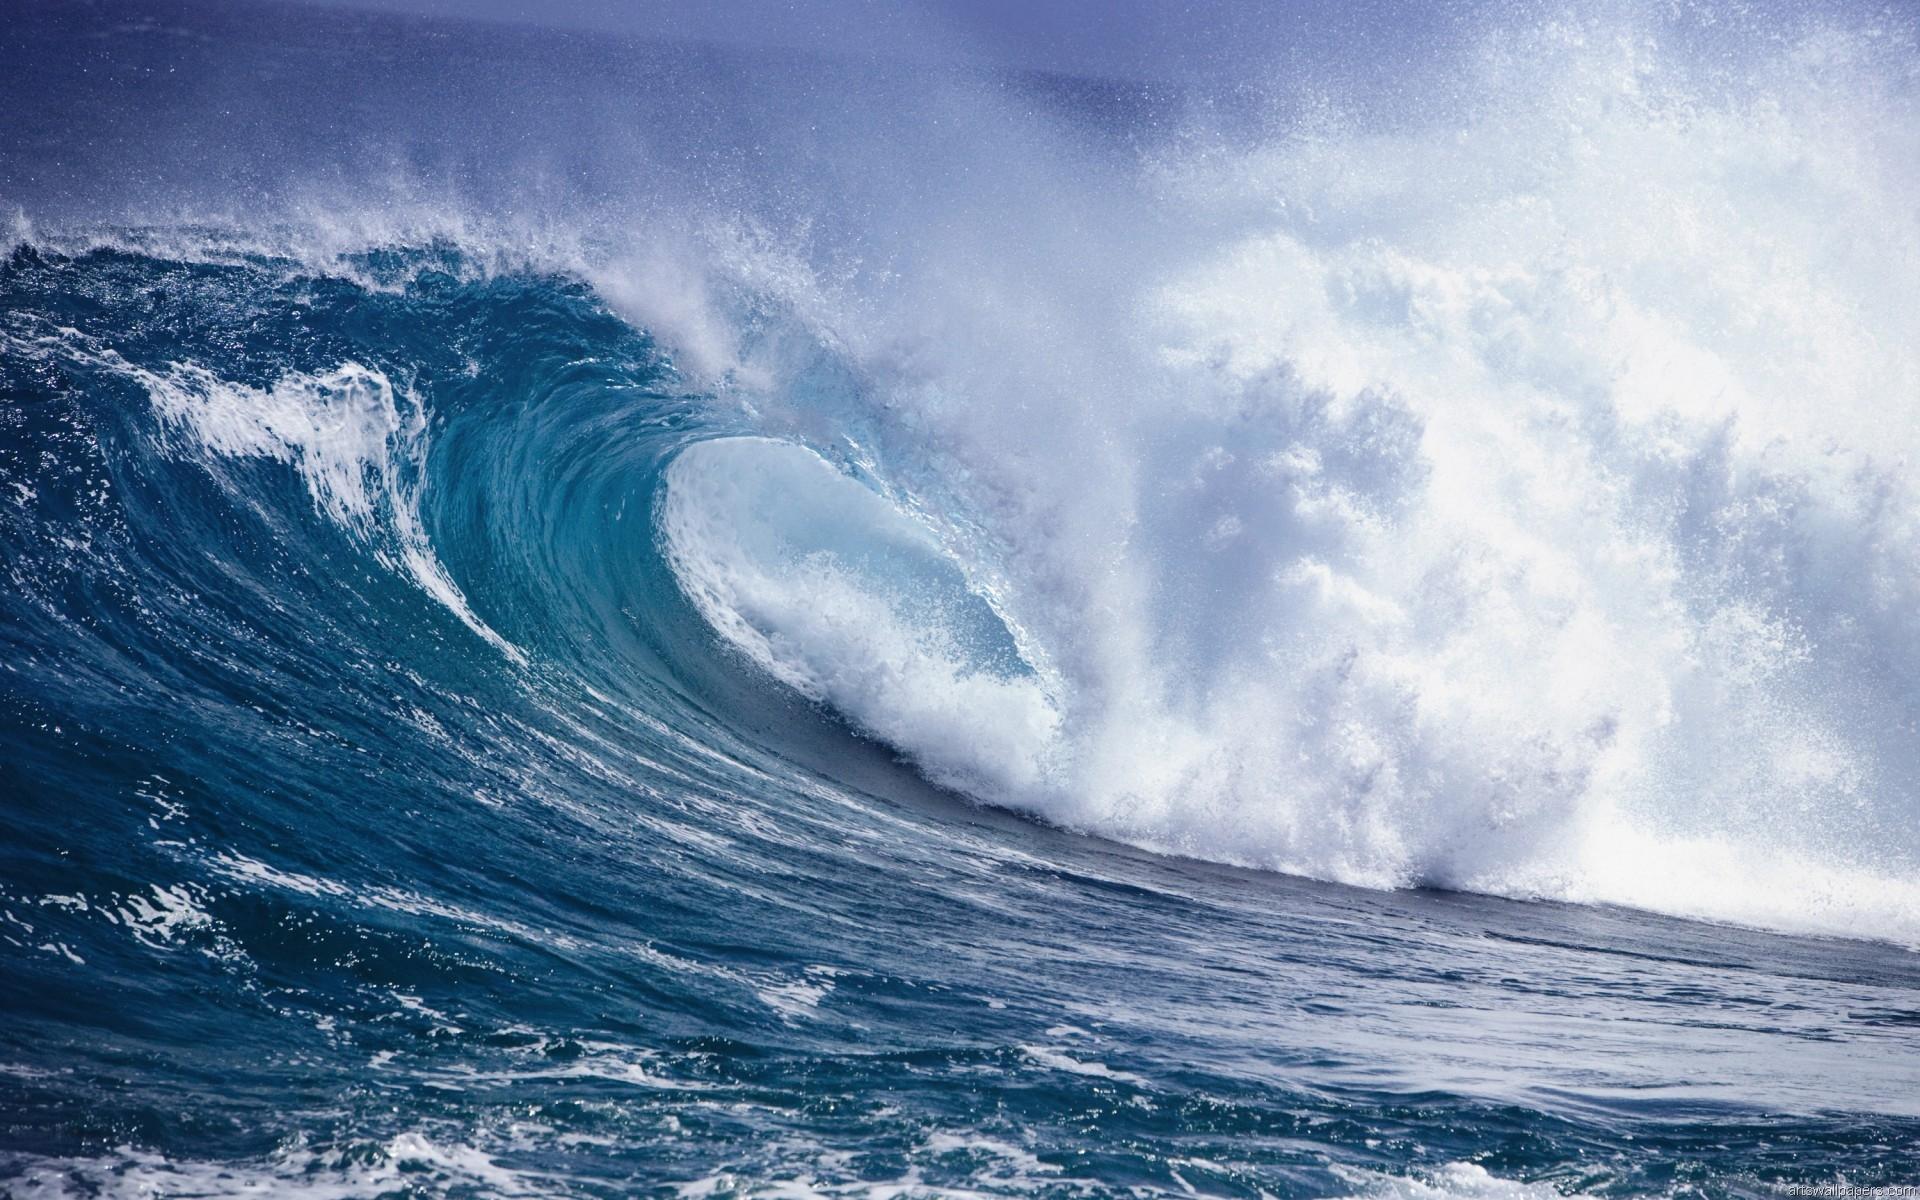 Sea Ocean Wallpaper HD Full HD 1080p Desktop Wallpaper Background 1920x1200